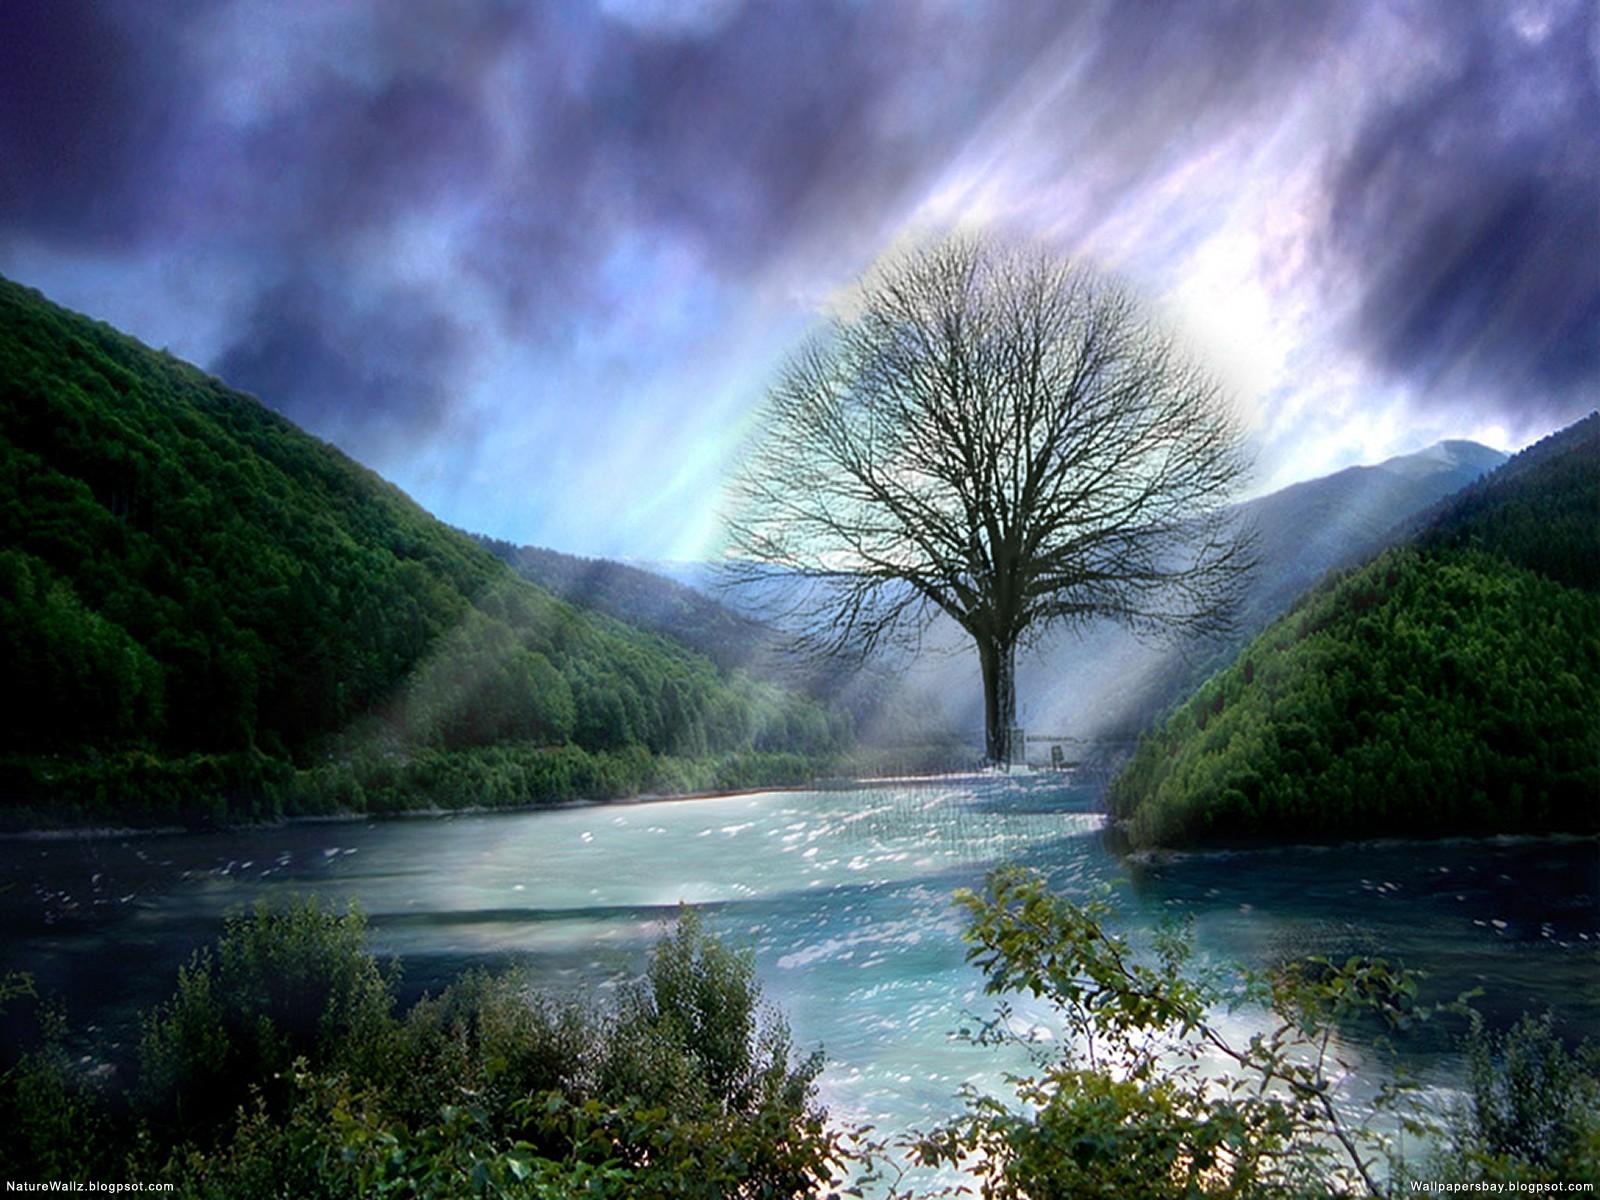 La source Blanche . Fantasy-Dream-Landscapes-Wallpapers-43+(wallpapersbay.blogspot.com)